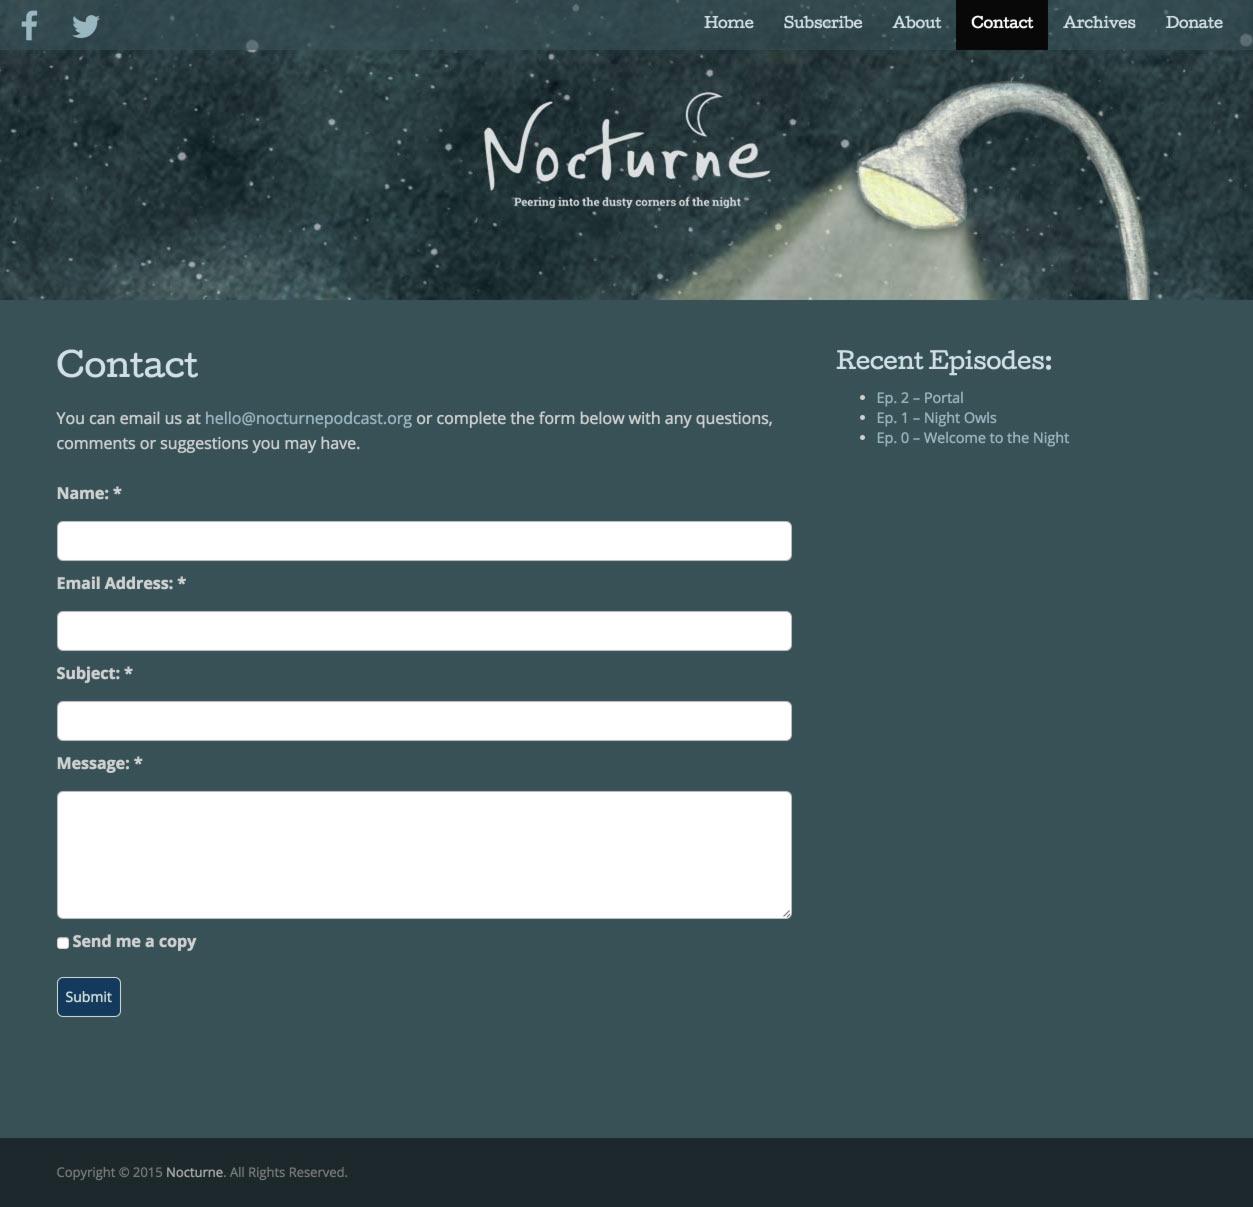 Eric Pedersen: Nocturne - Contact